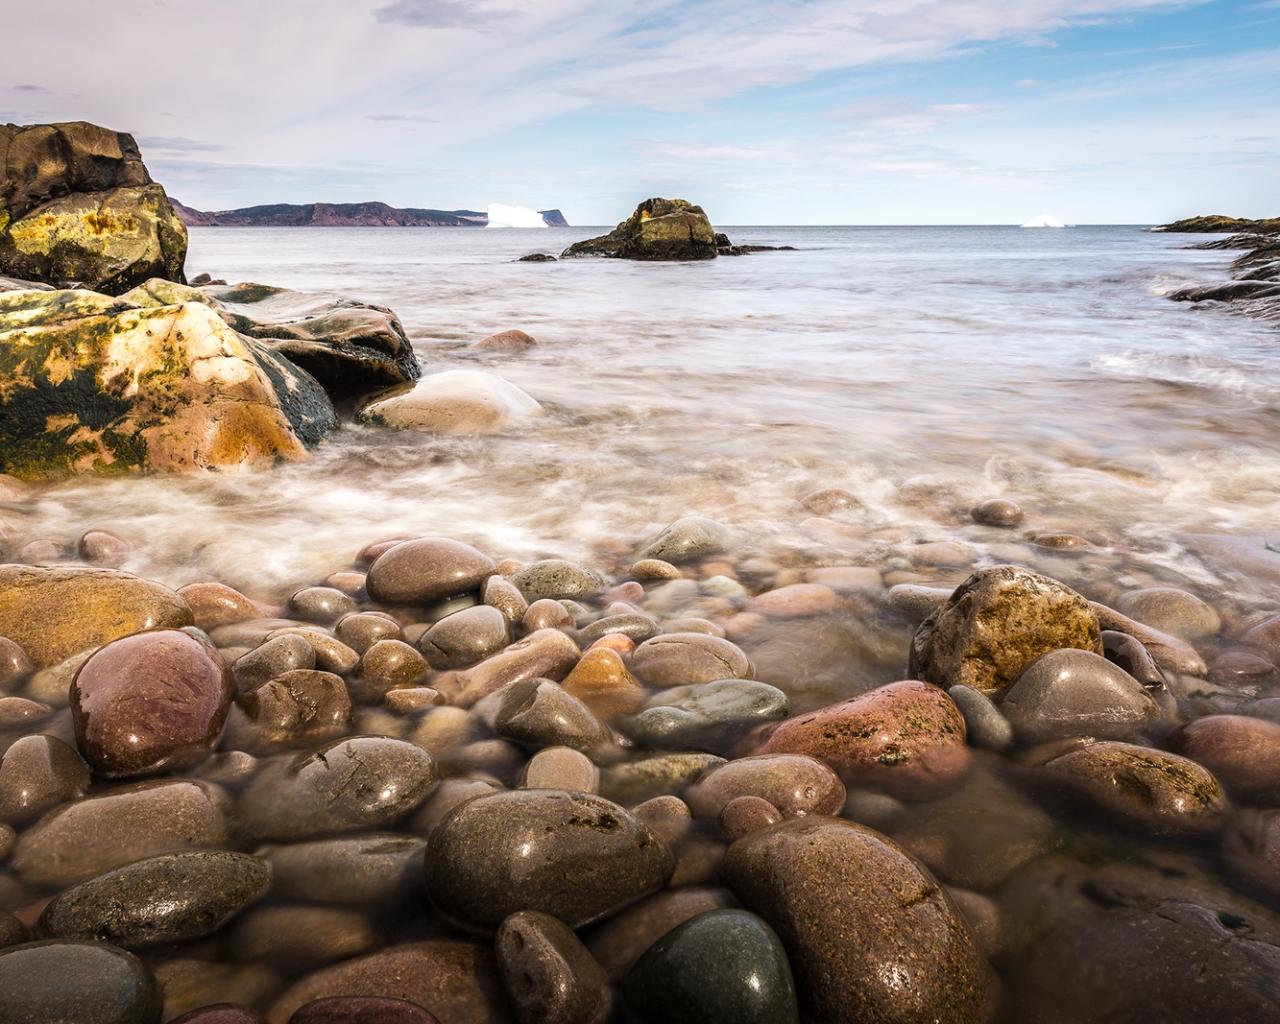 Playa de Newfoundland - 1280x1024